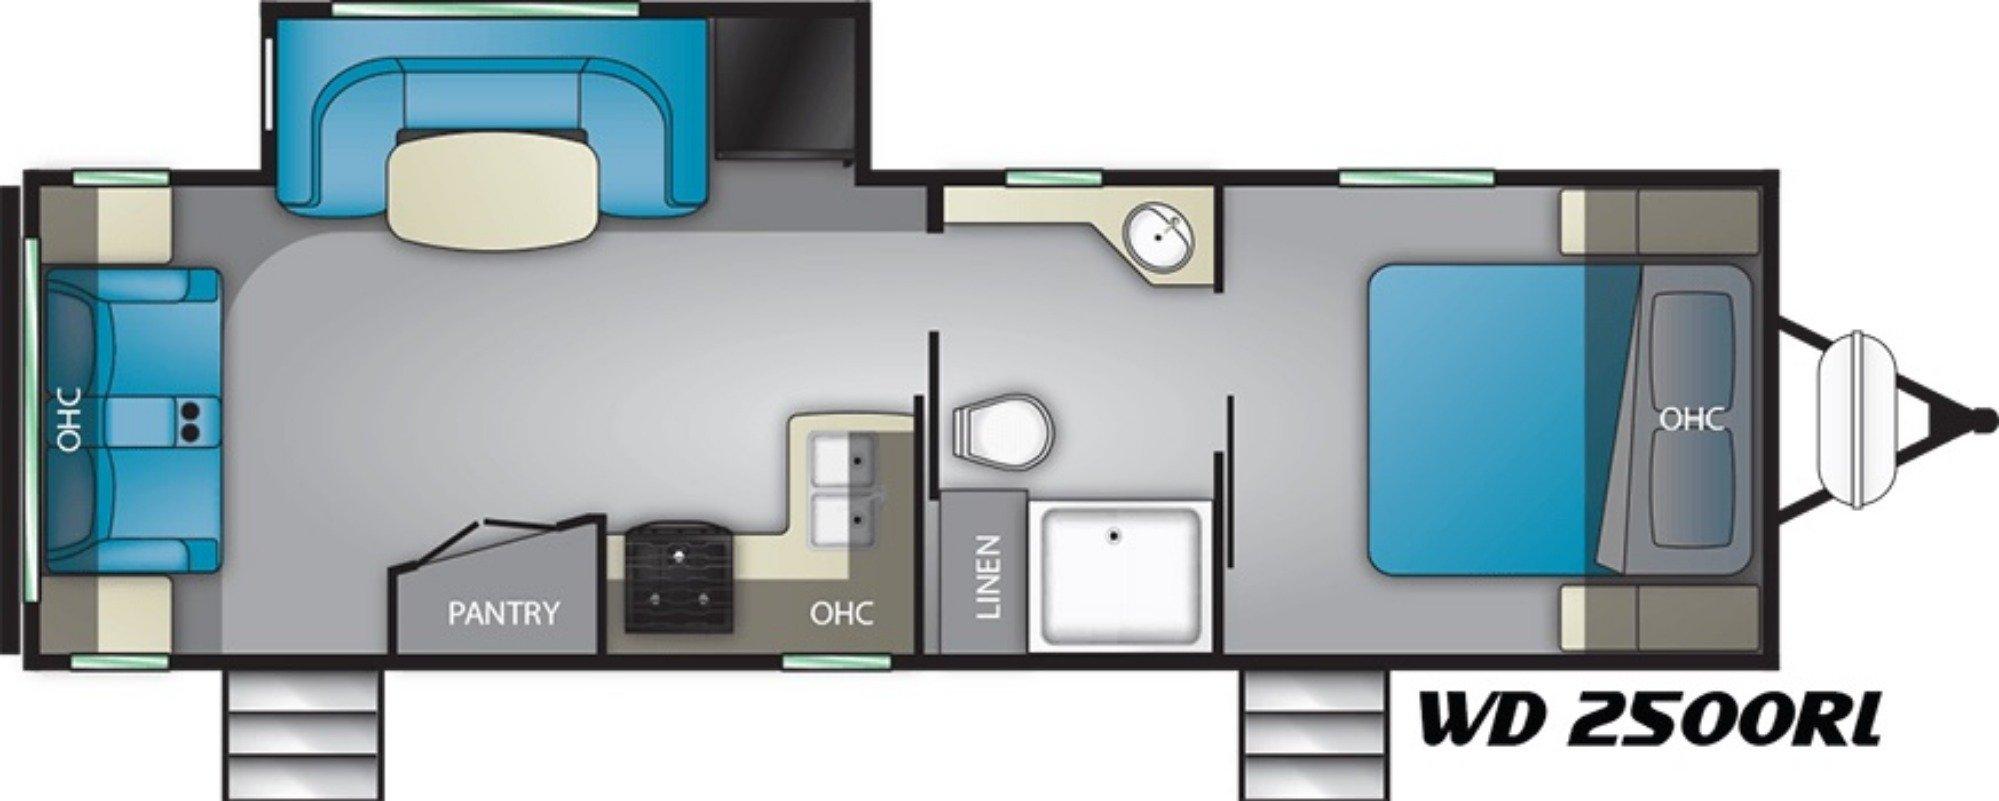 View Floor Plan for 2019 HEARTLAND WILDERNESS 2500RL